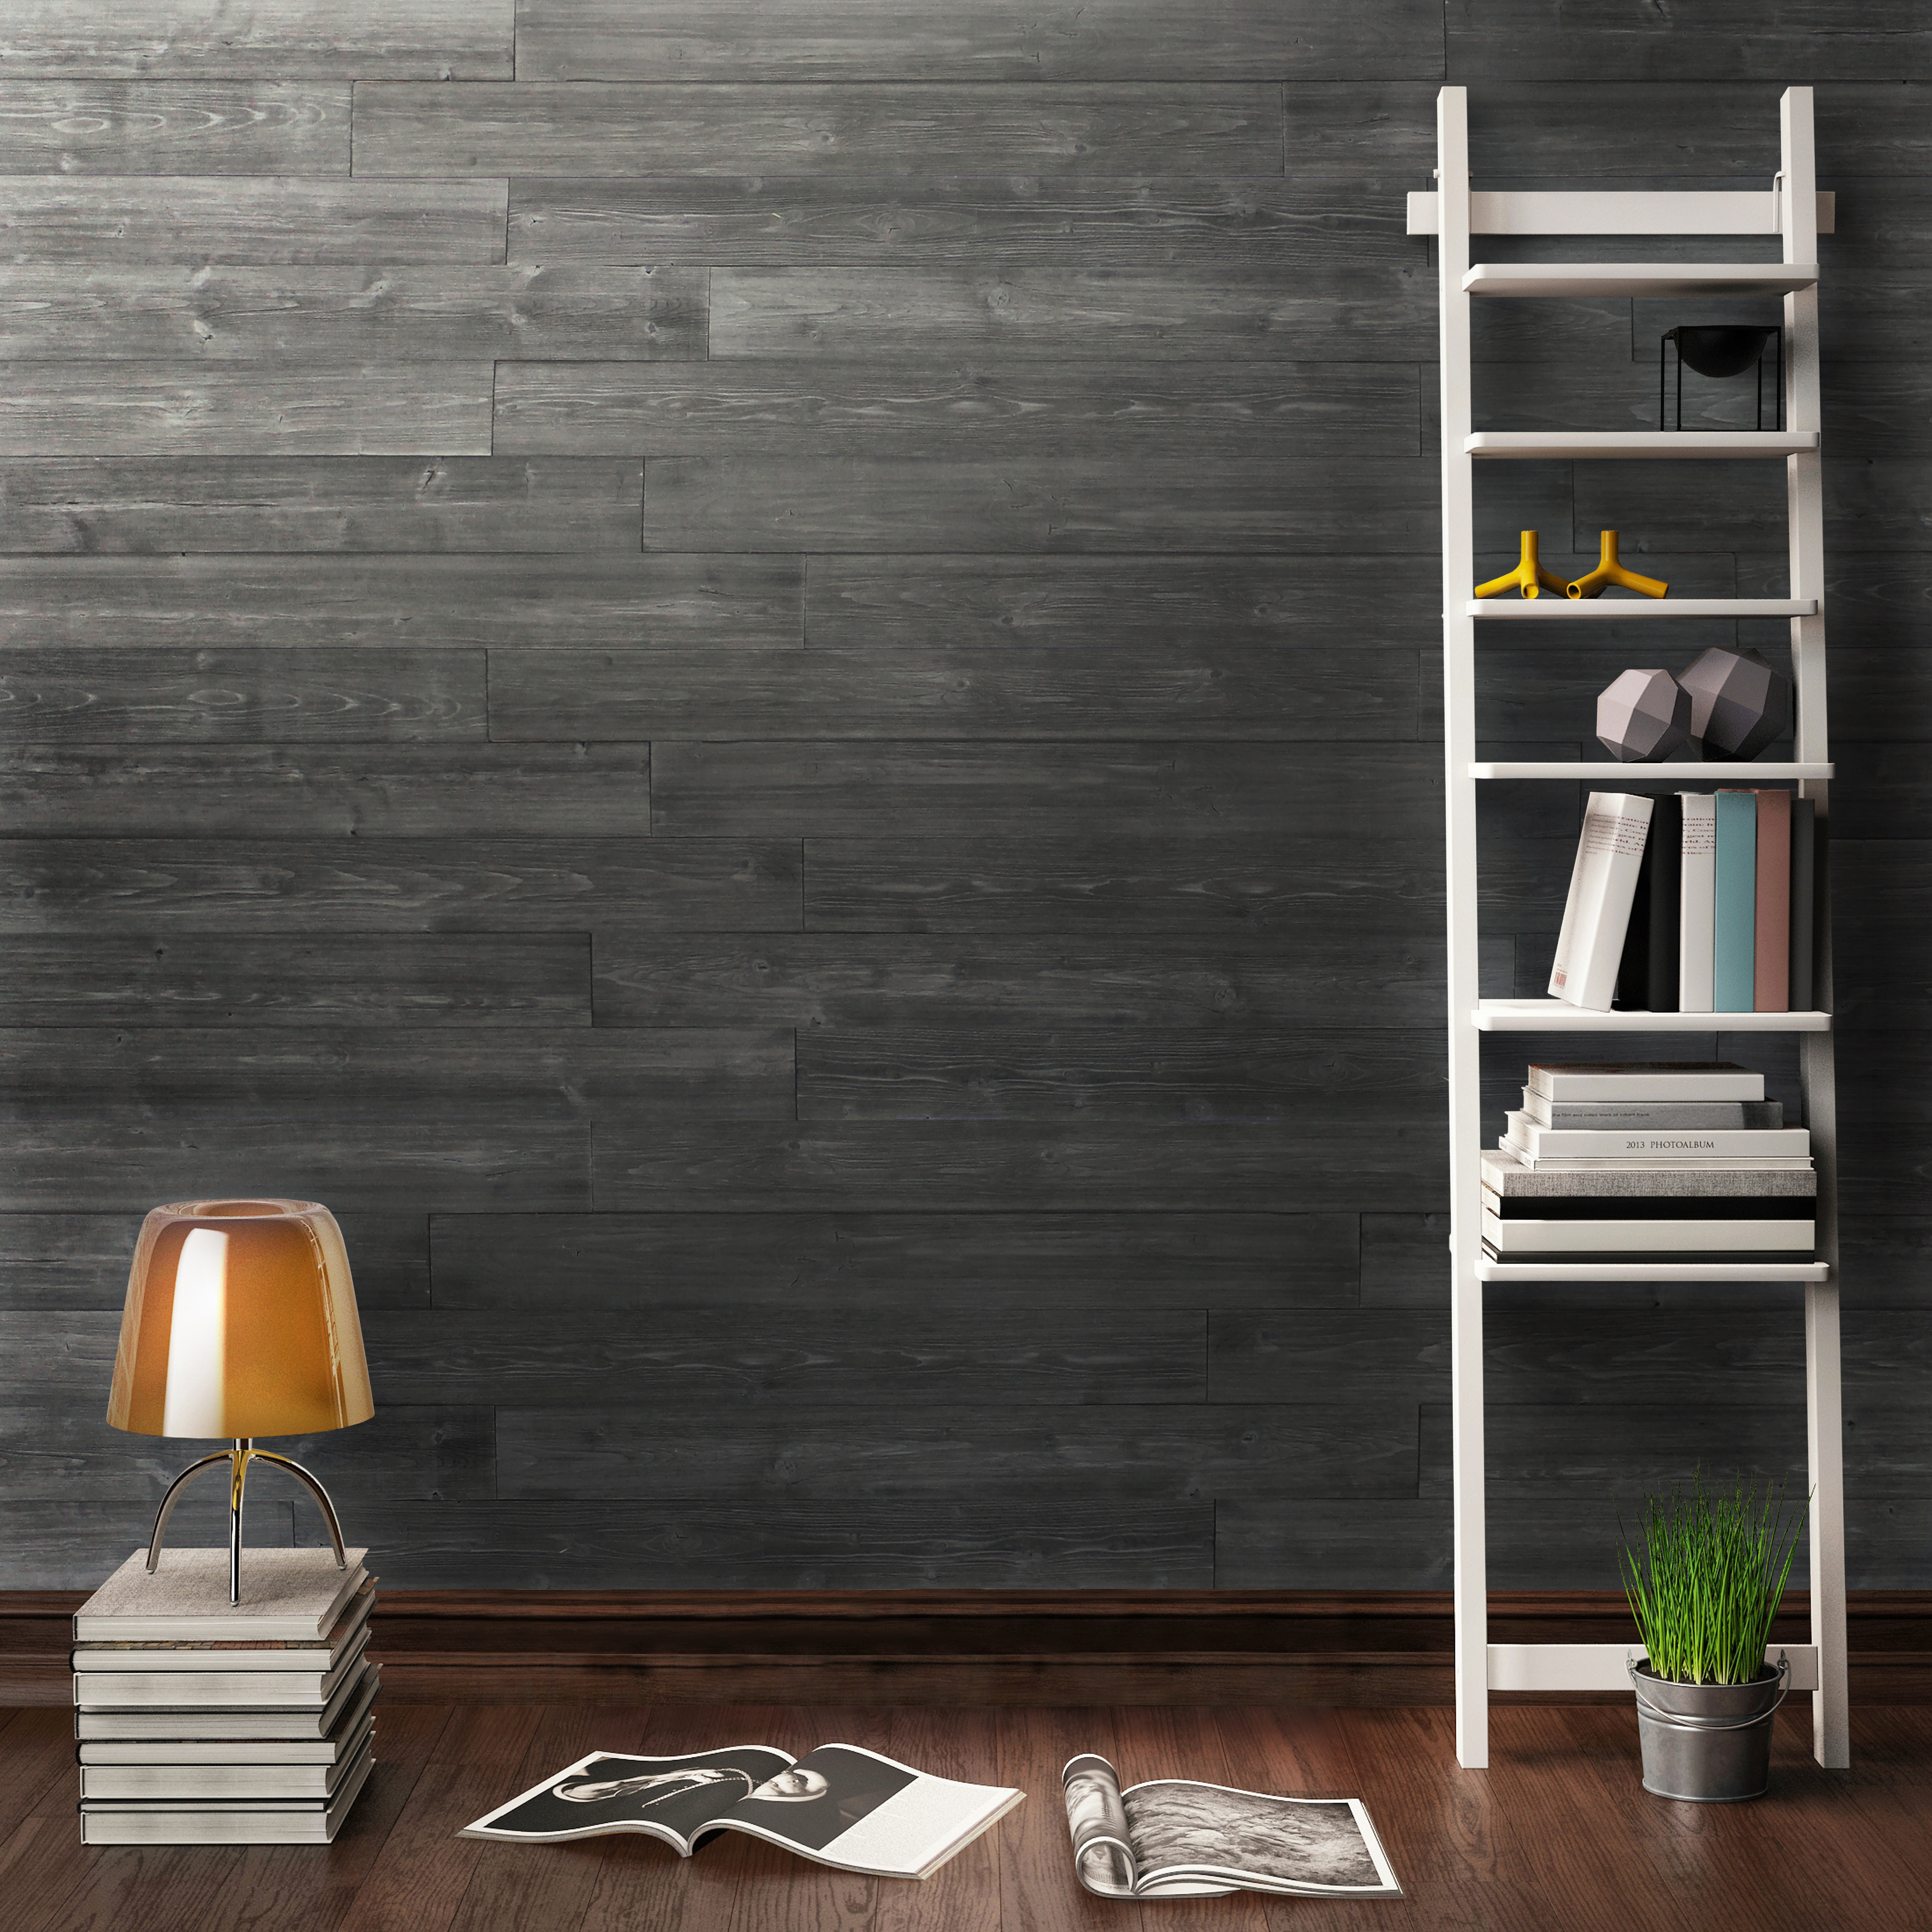 Peel Amp Stick Diy Real Wood Wall Plank Or Panel Rustic